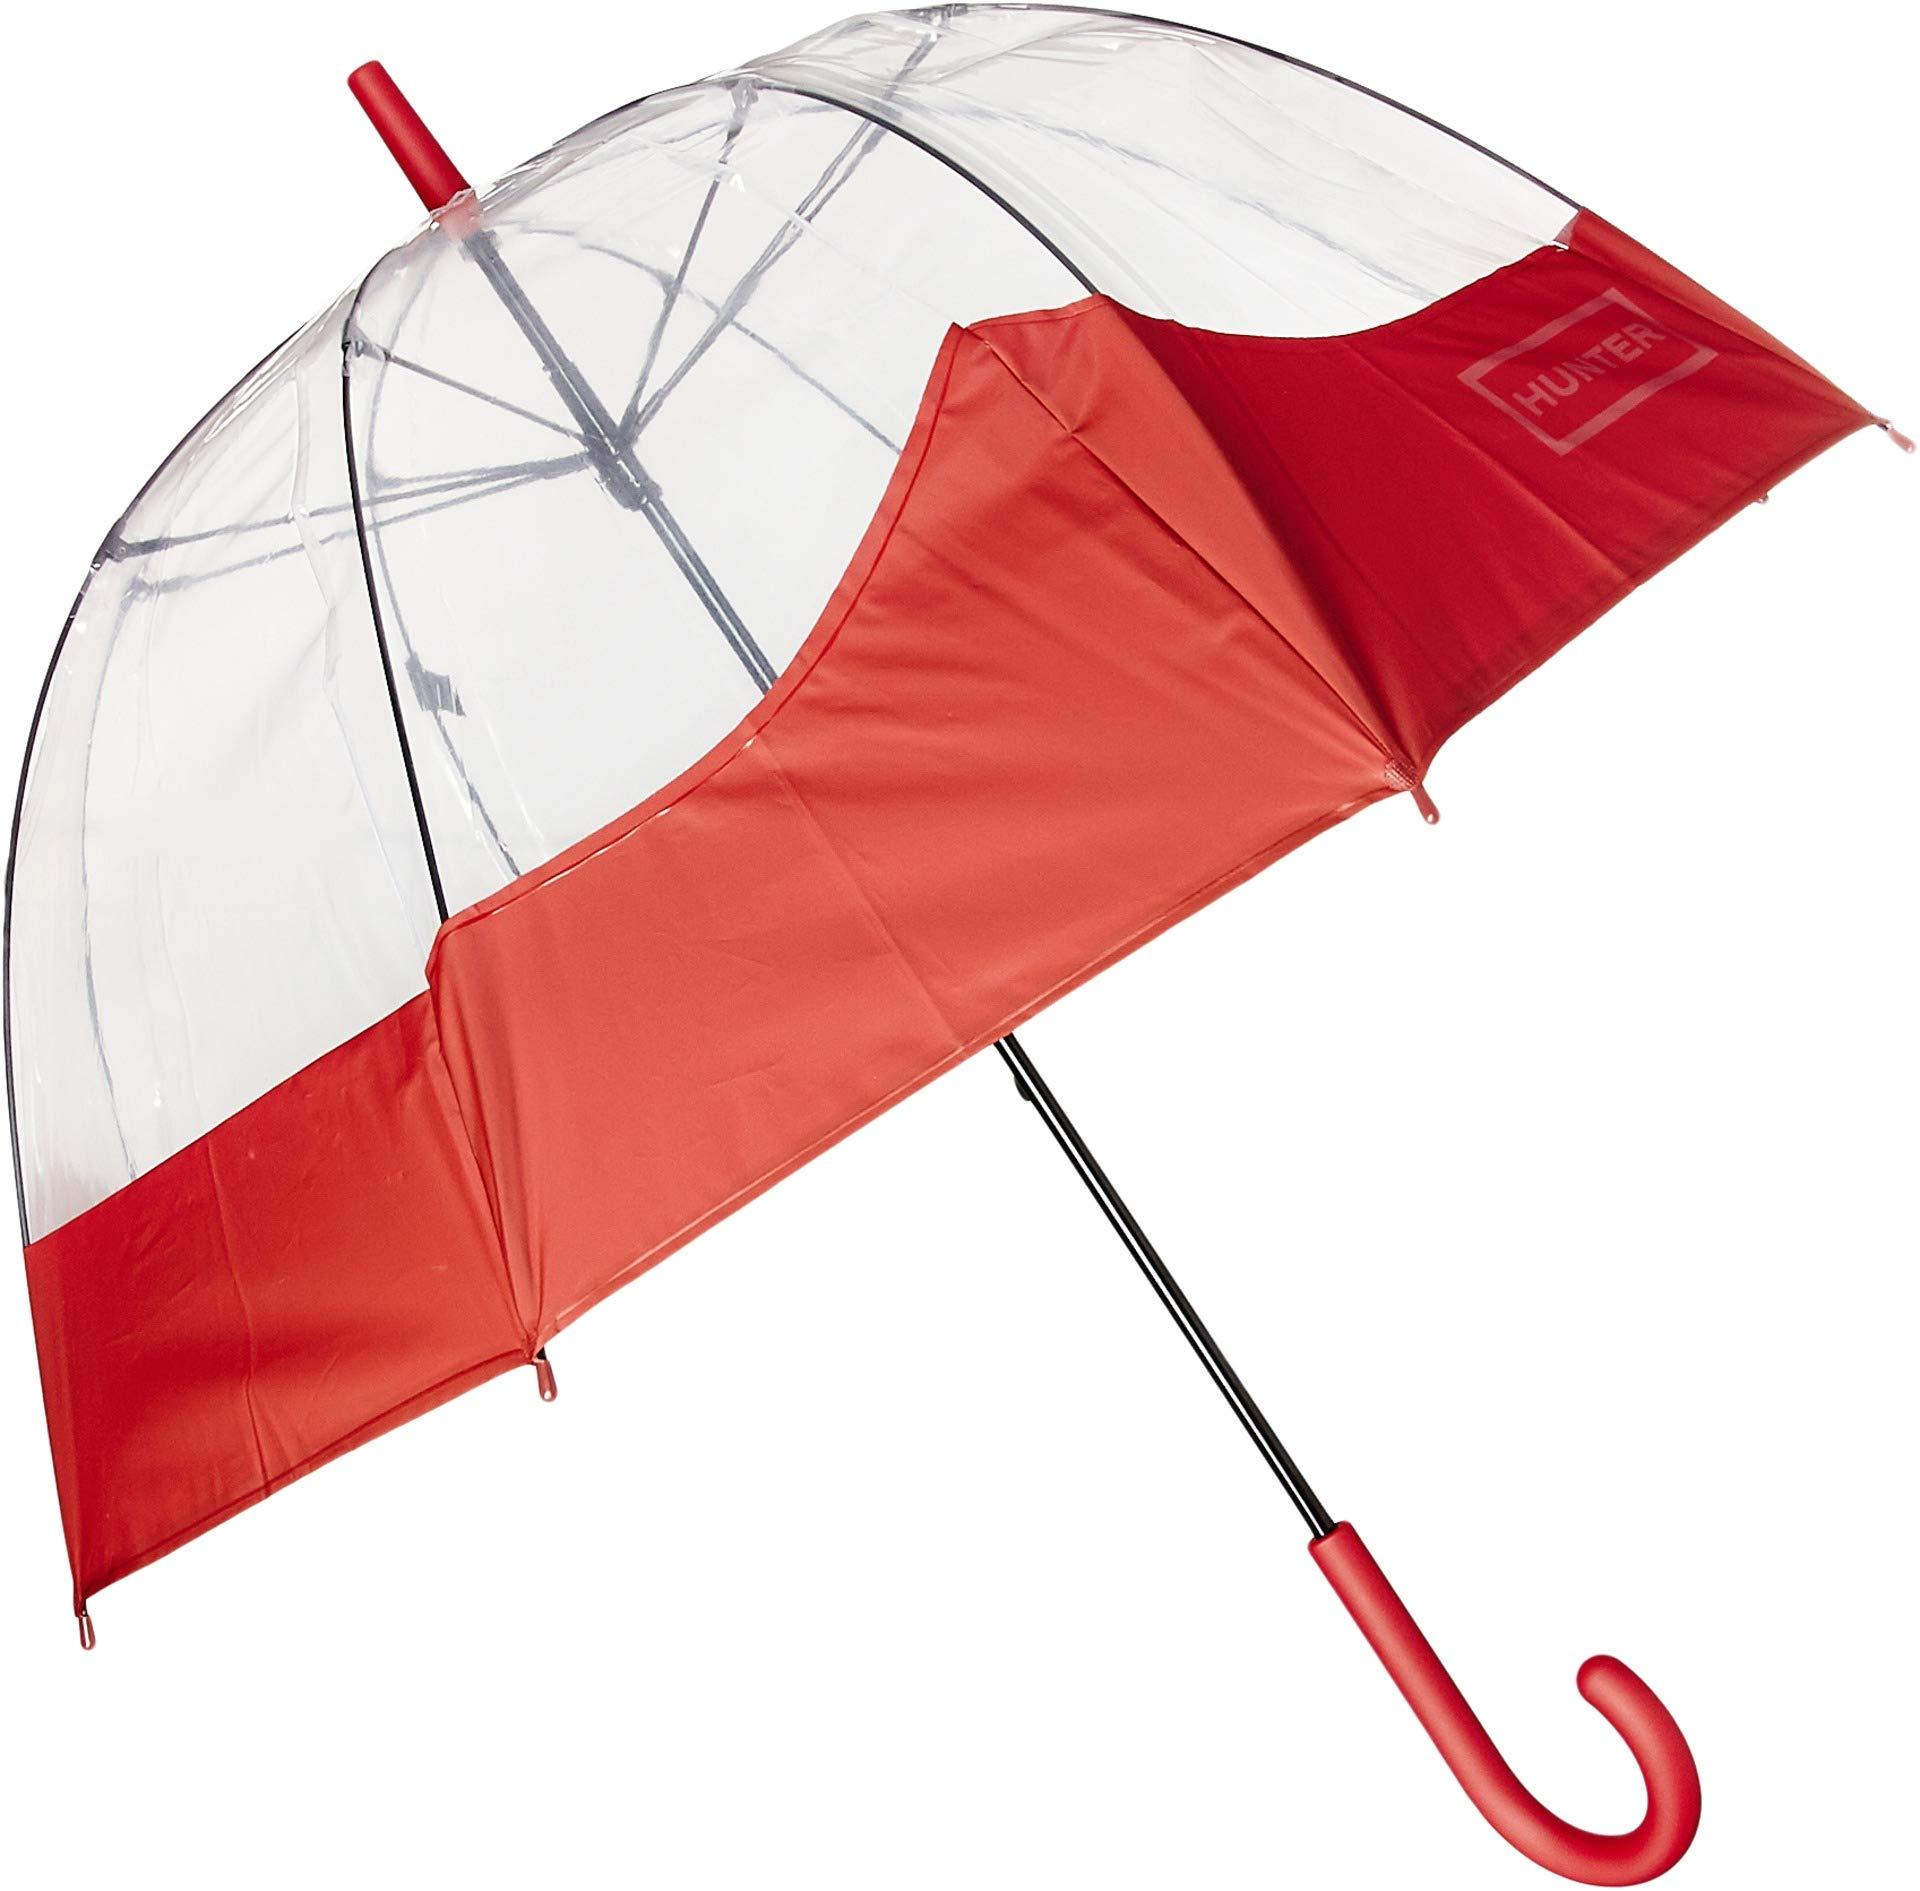 Hunter Unisex Original Welded Moustache Bubble Umbrella Military Red One Size